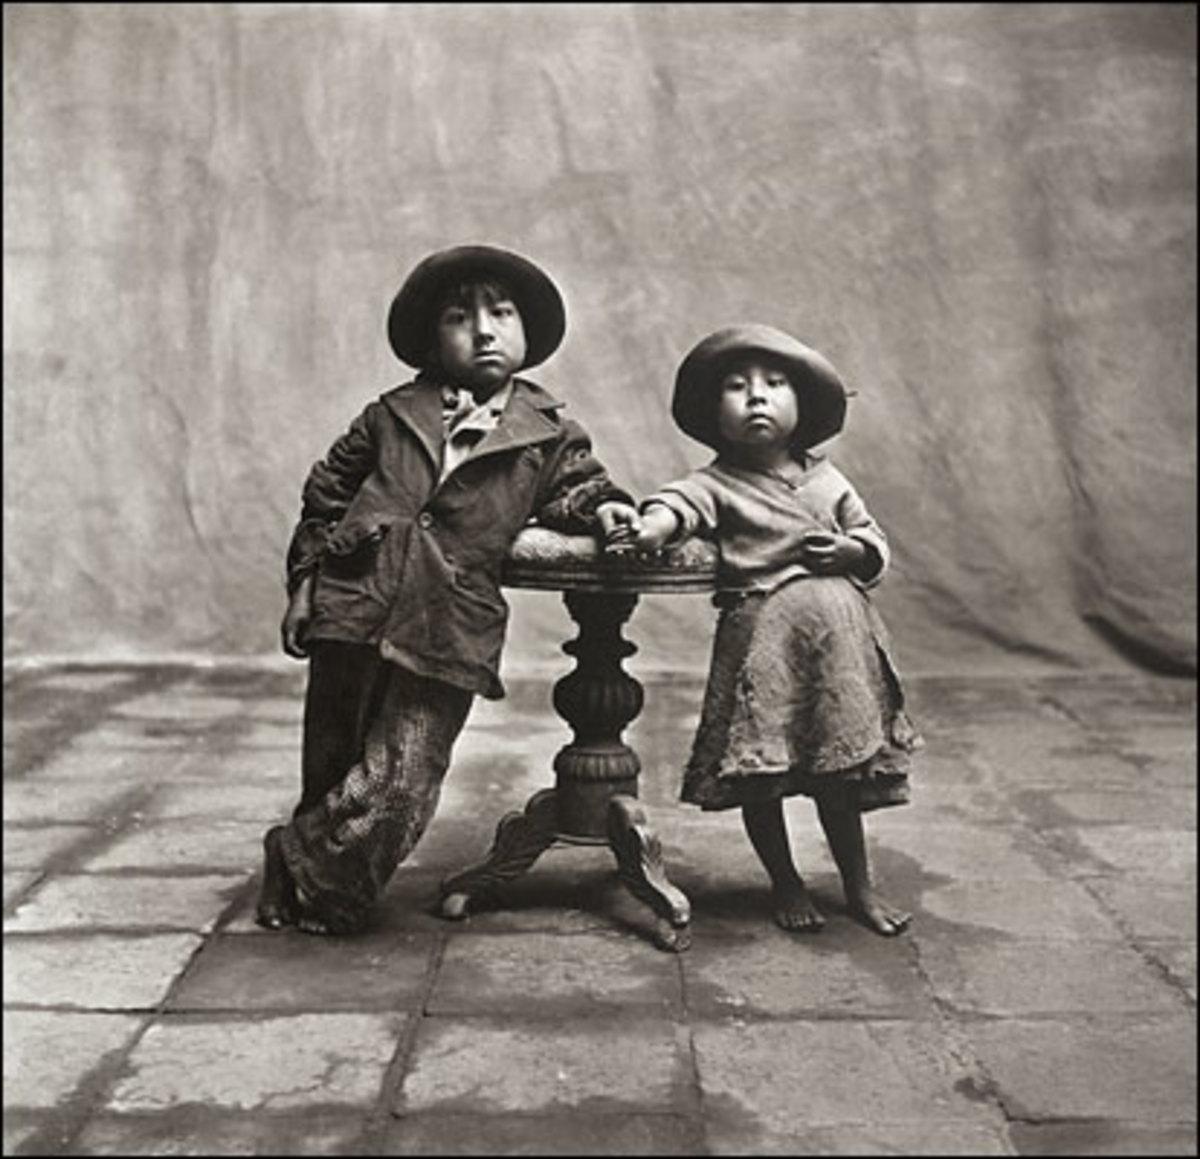 irving-penns-extraordinary-portrait-photographs